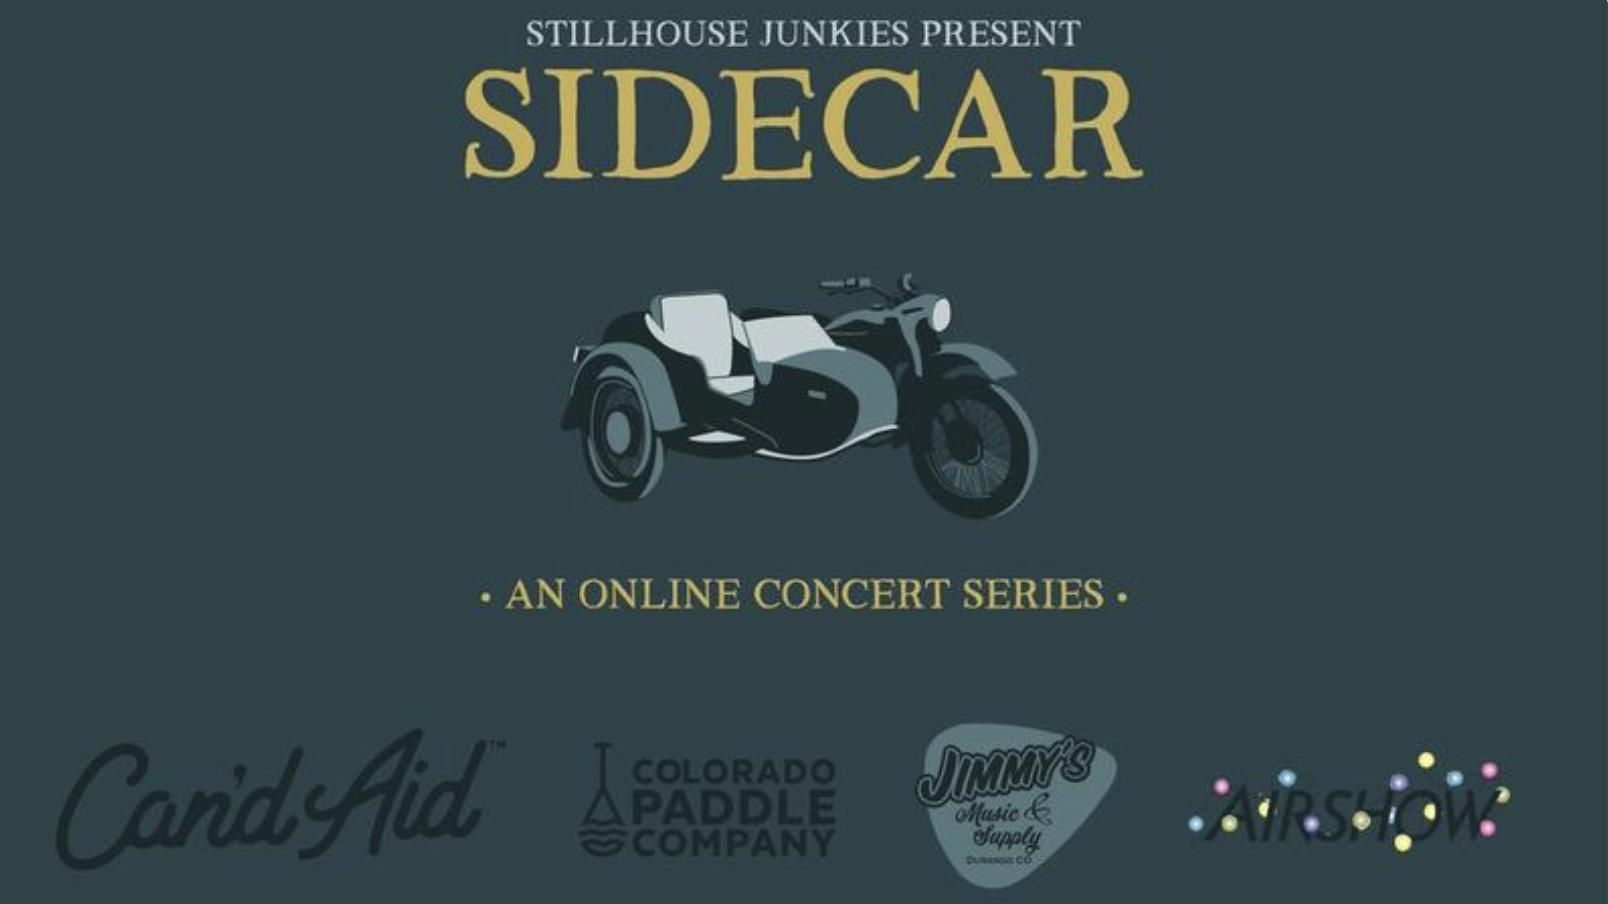 Stillhouse Junkies Sidecar.png